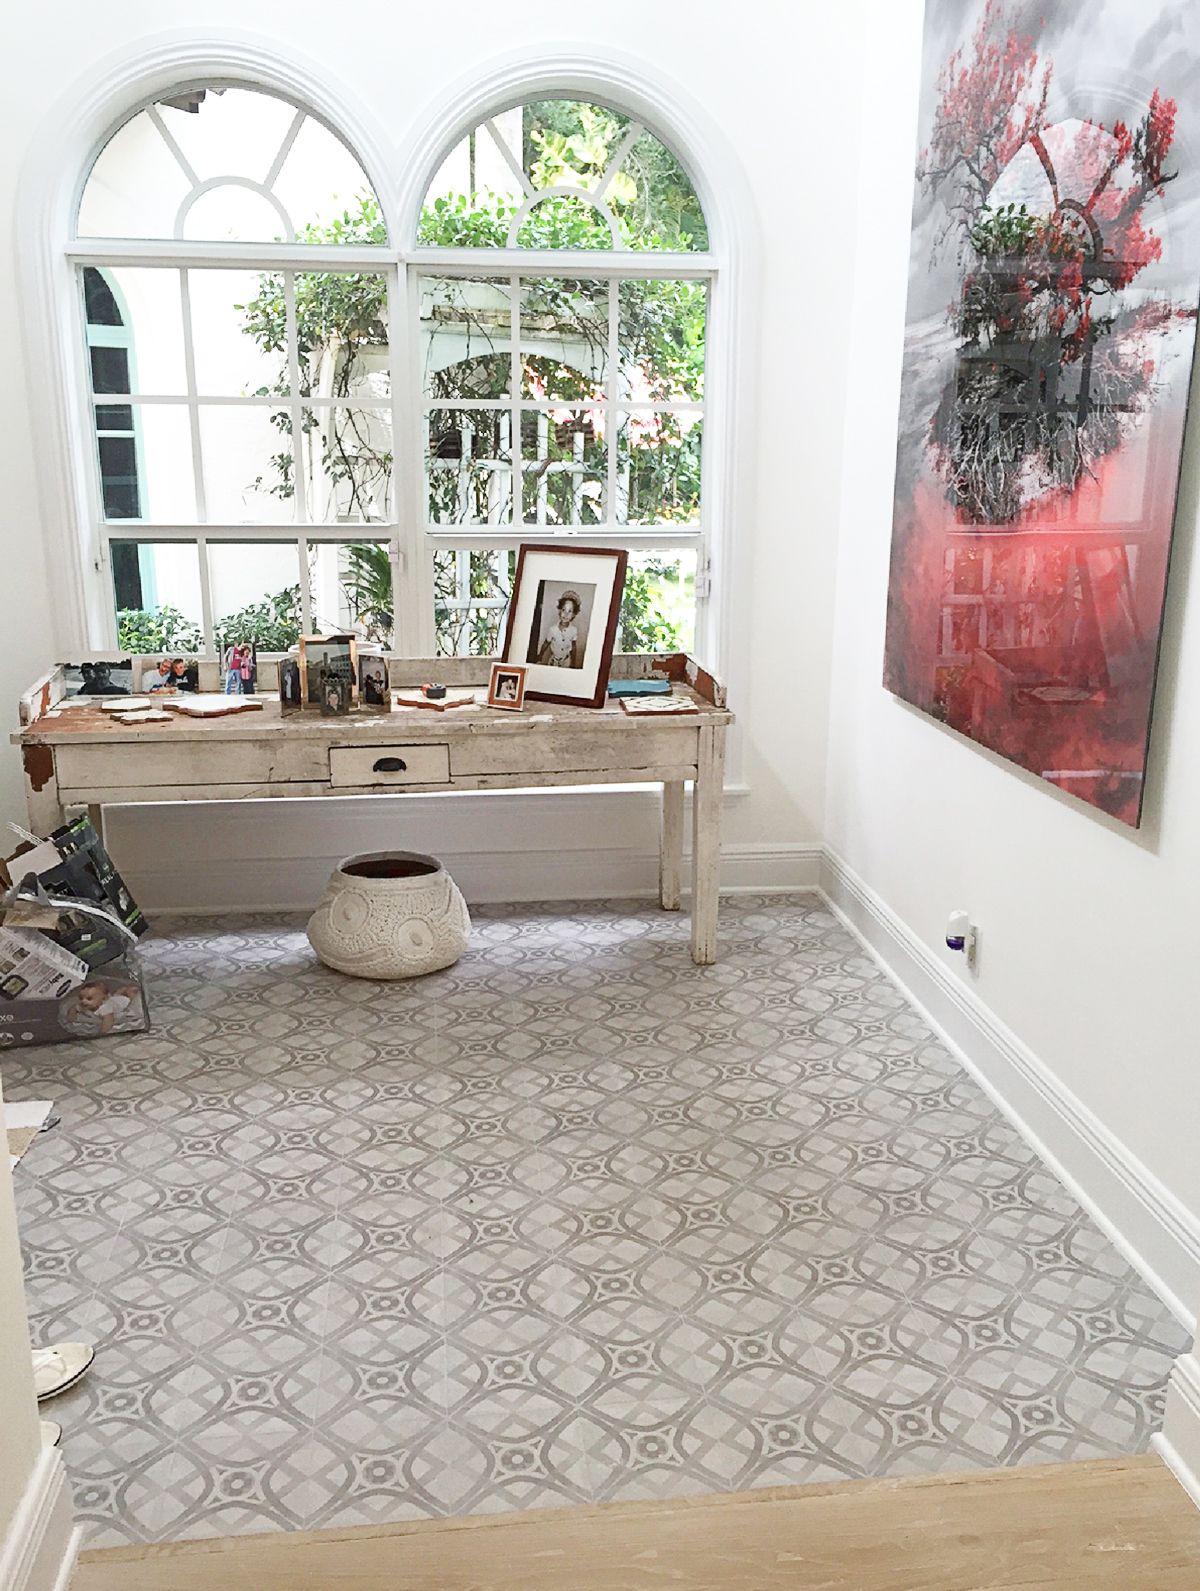 This Floor Tile Looks Like Printed Cement And Is A Tile Called Marrakech Porcelain Tile Subtle Grey Designs Work Great A Tile Print Gray Design Porcelain Tile